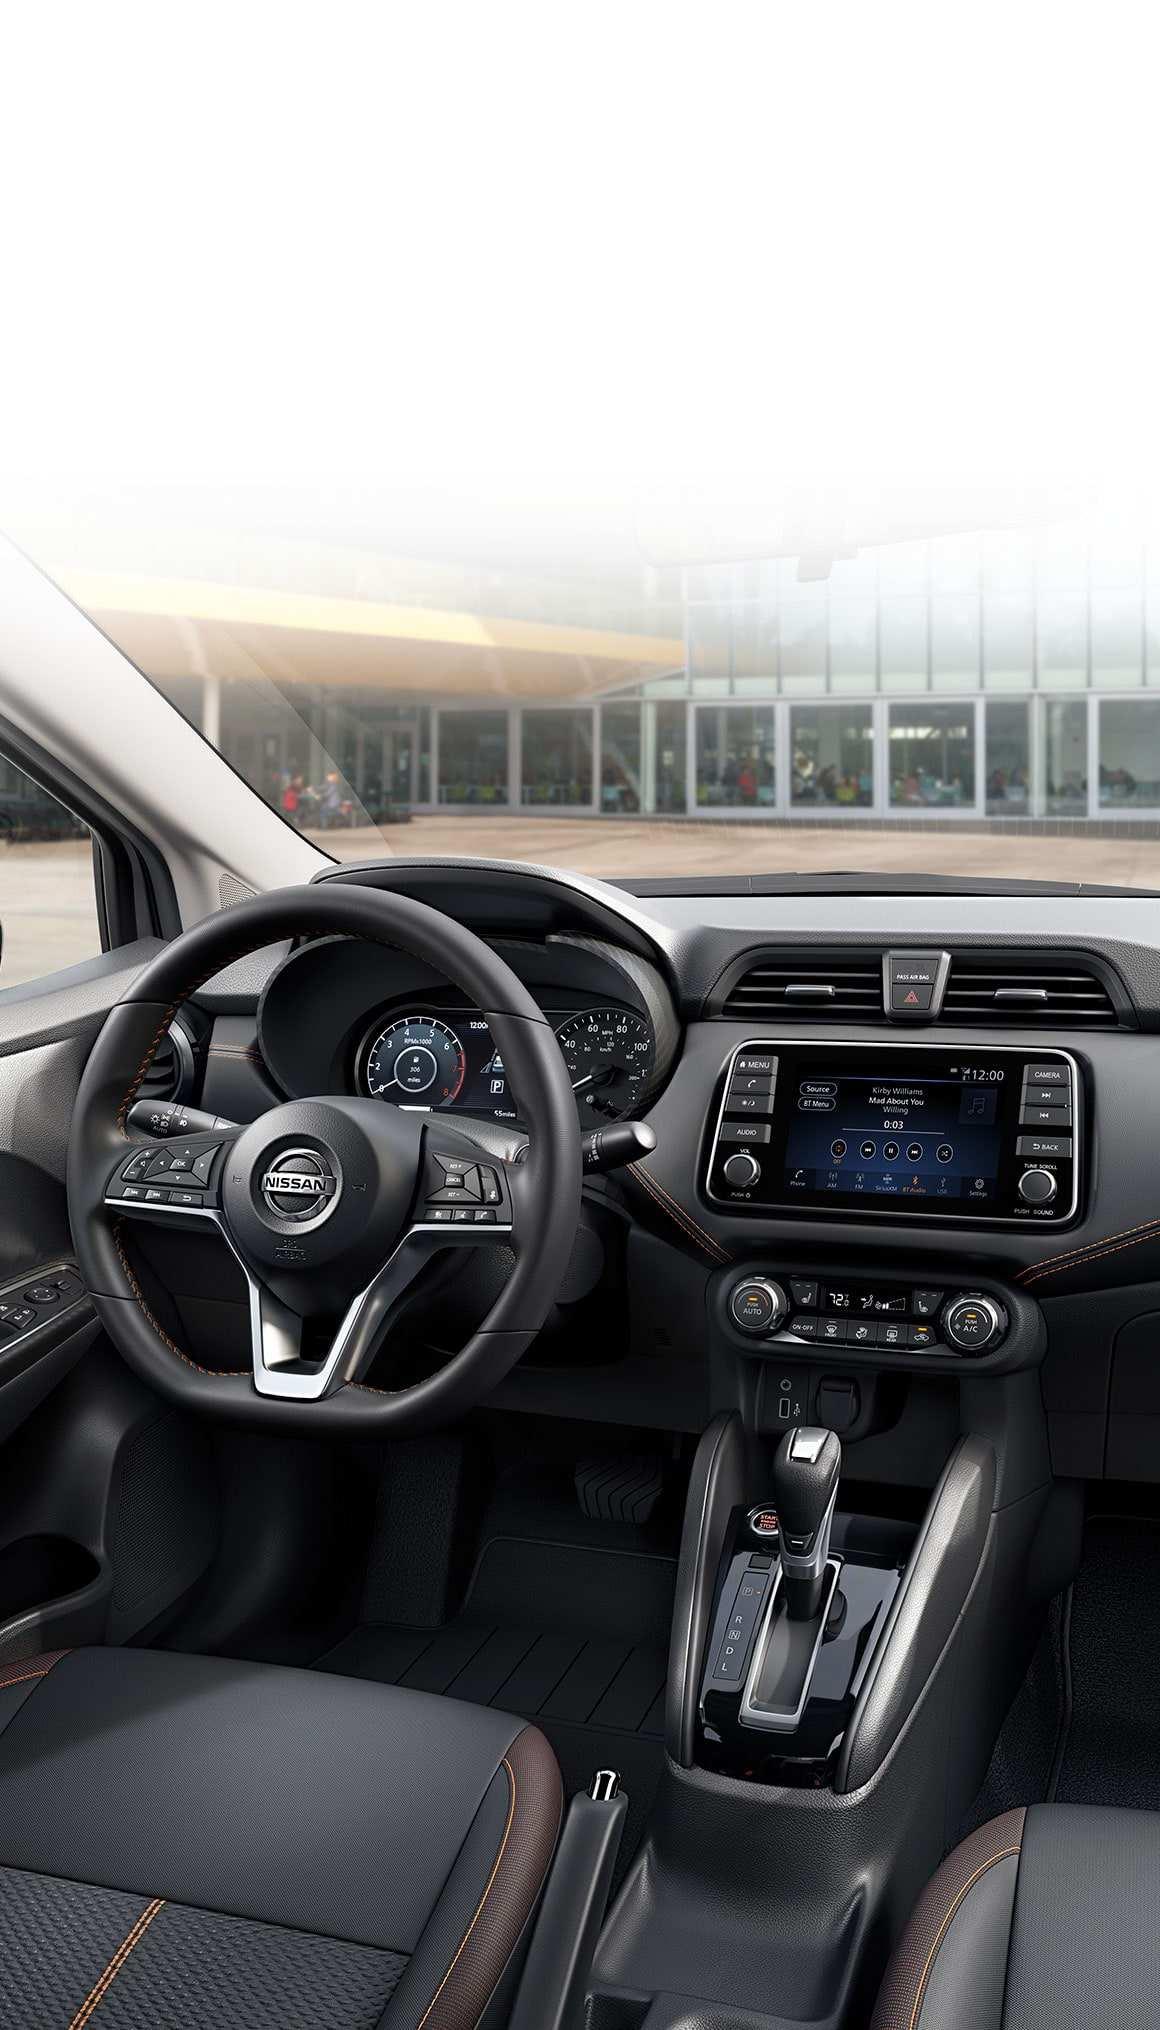 86 Gallery of Nissan Versa 2020 Ratings for Nissan Versa 2020